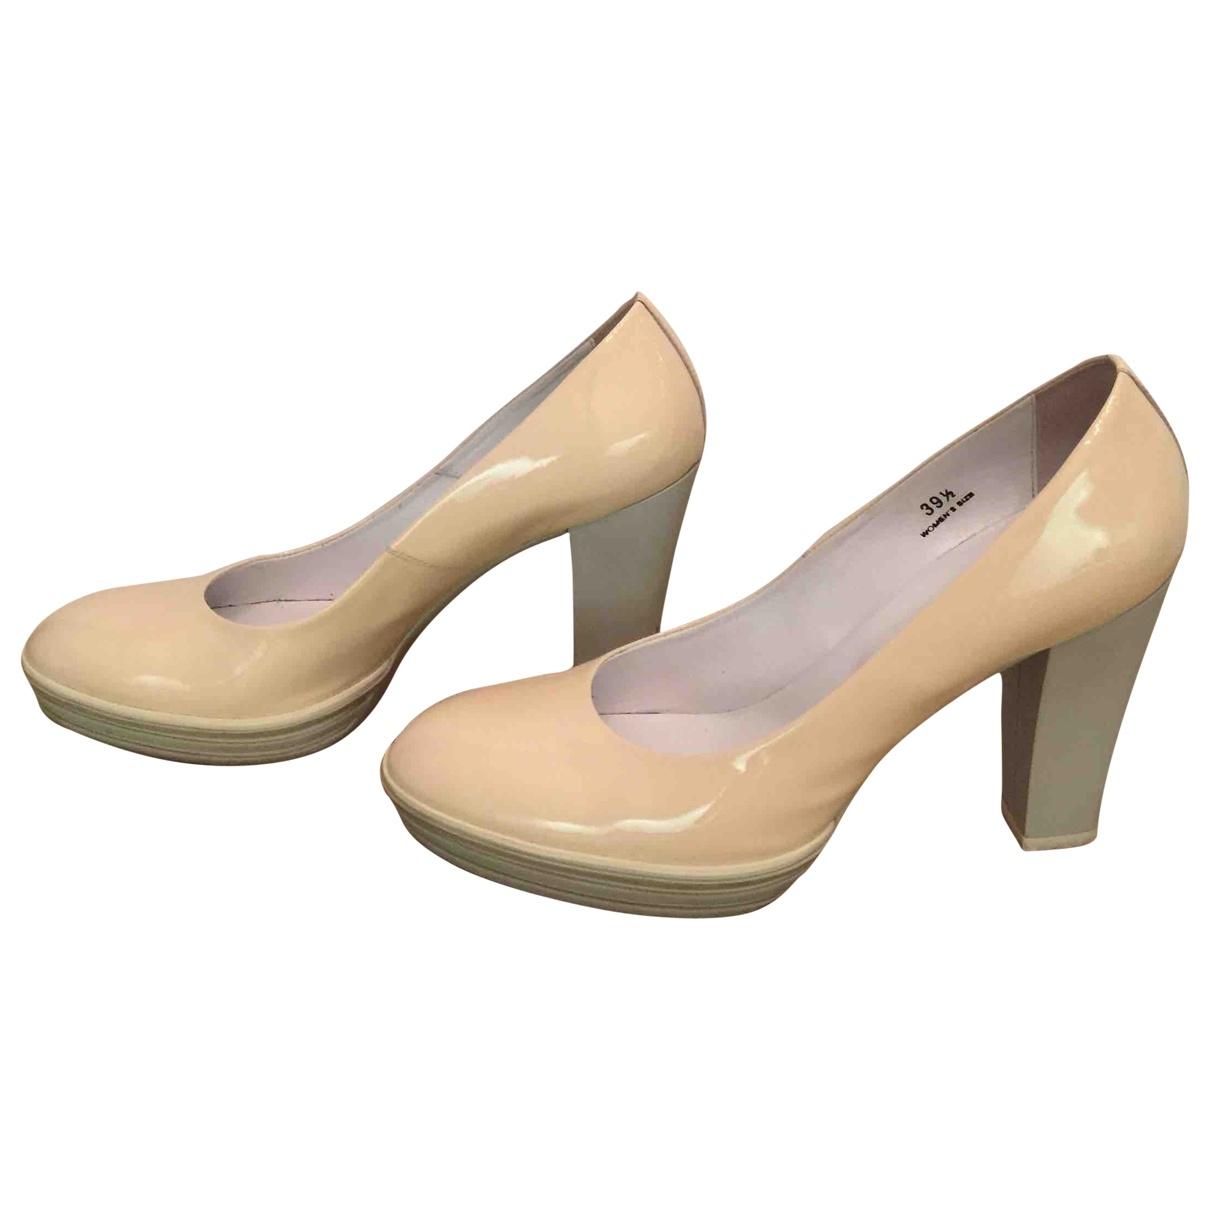 Hogan \N Pink Patent leather Heels for Women 39.5 EU